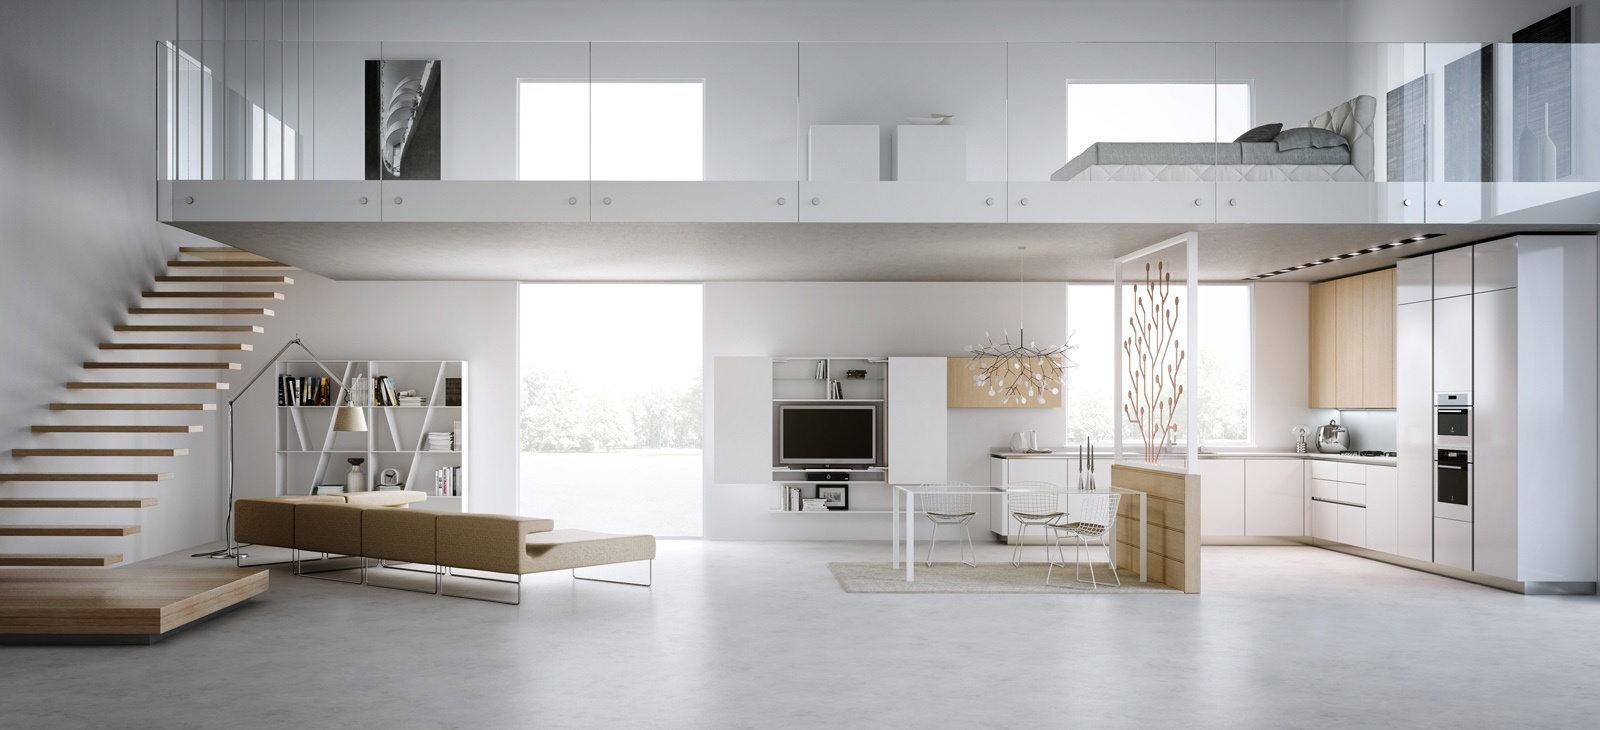 Modern loft layoutInterior Design Ideas.